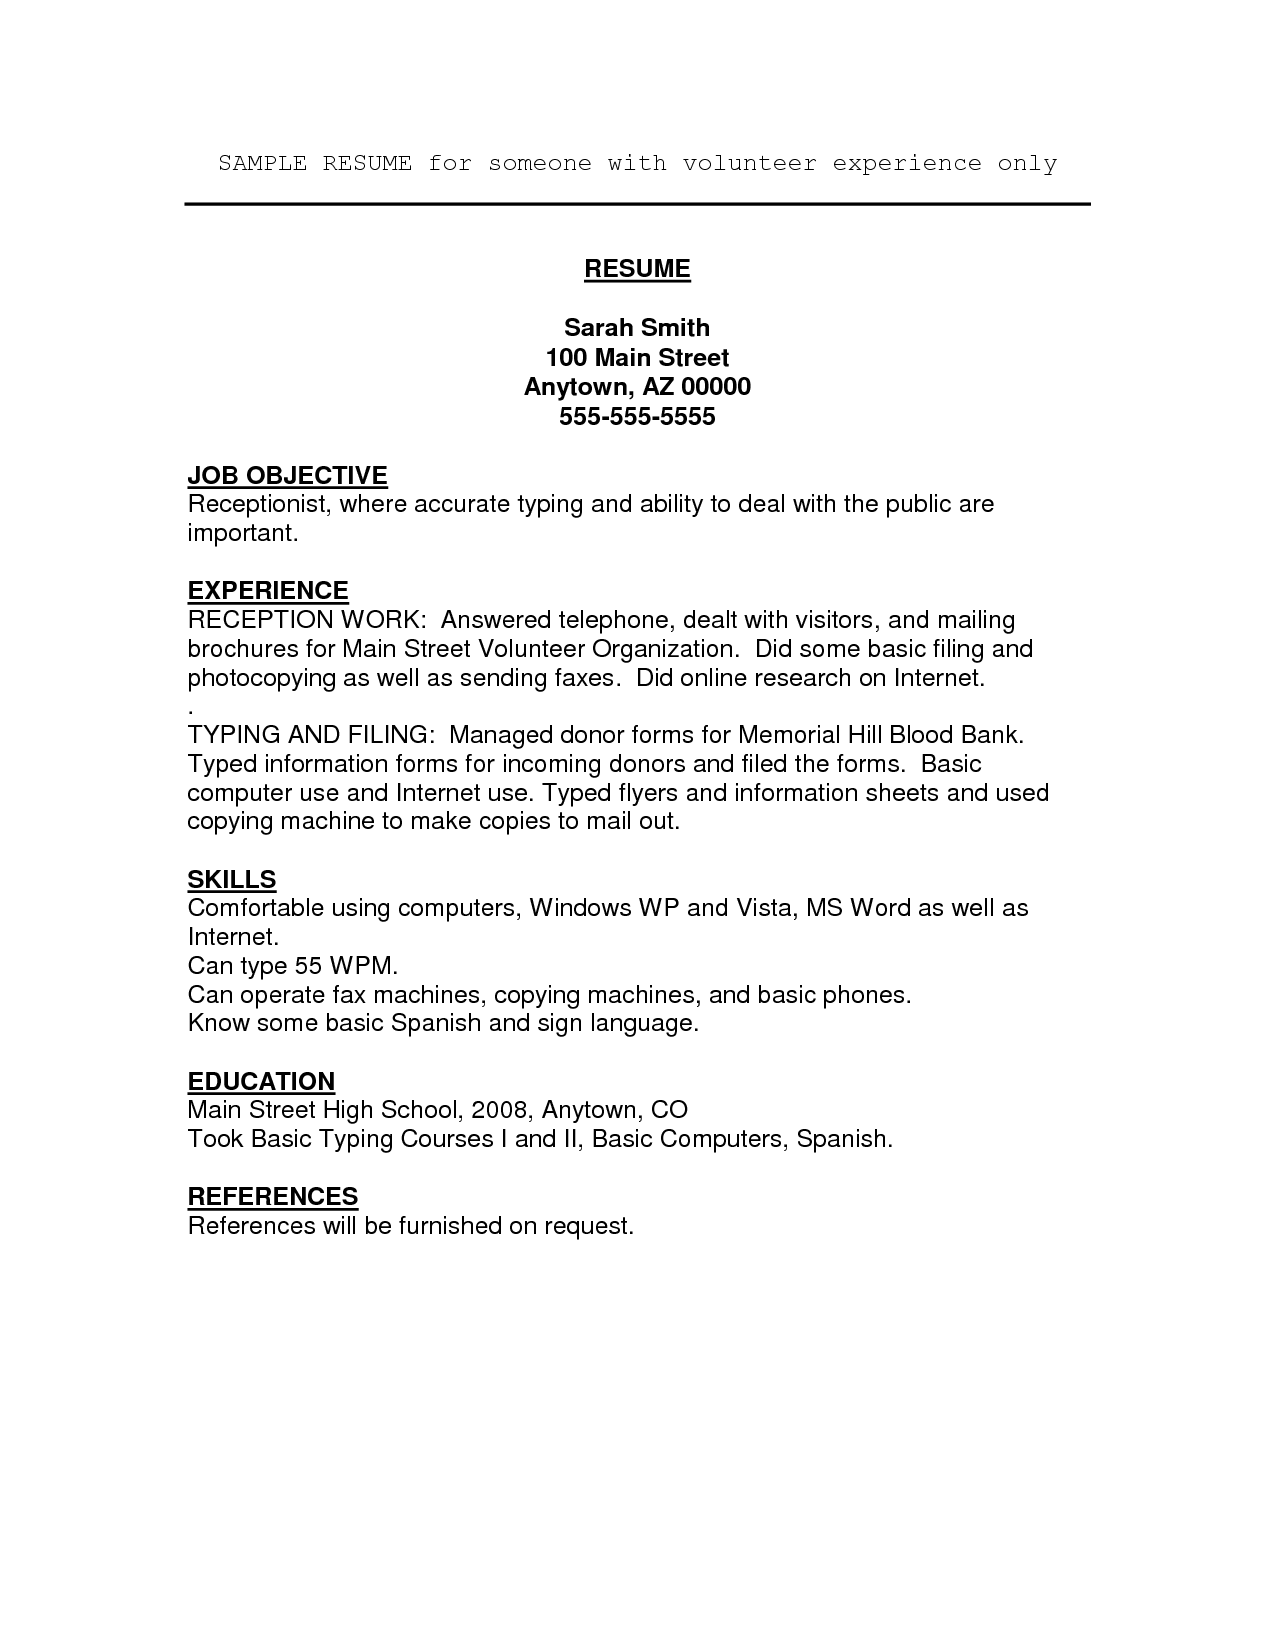 20 Resume Work Experience Examples Sample Resumes